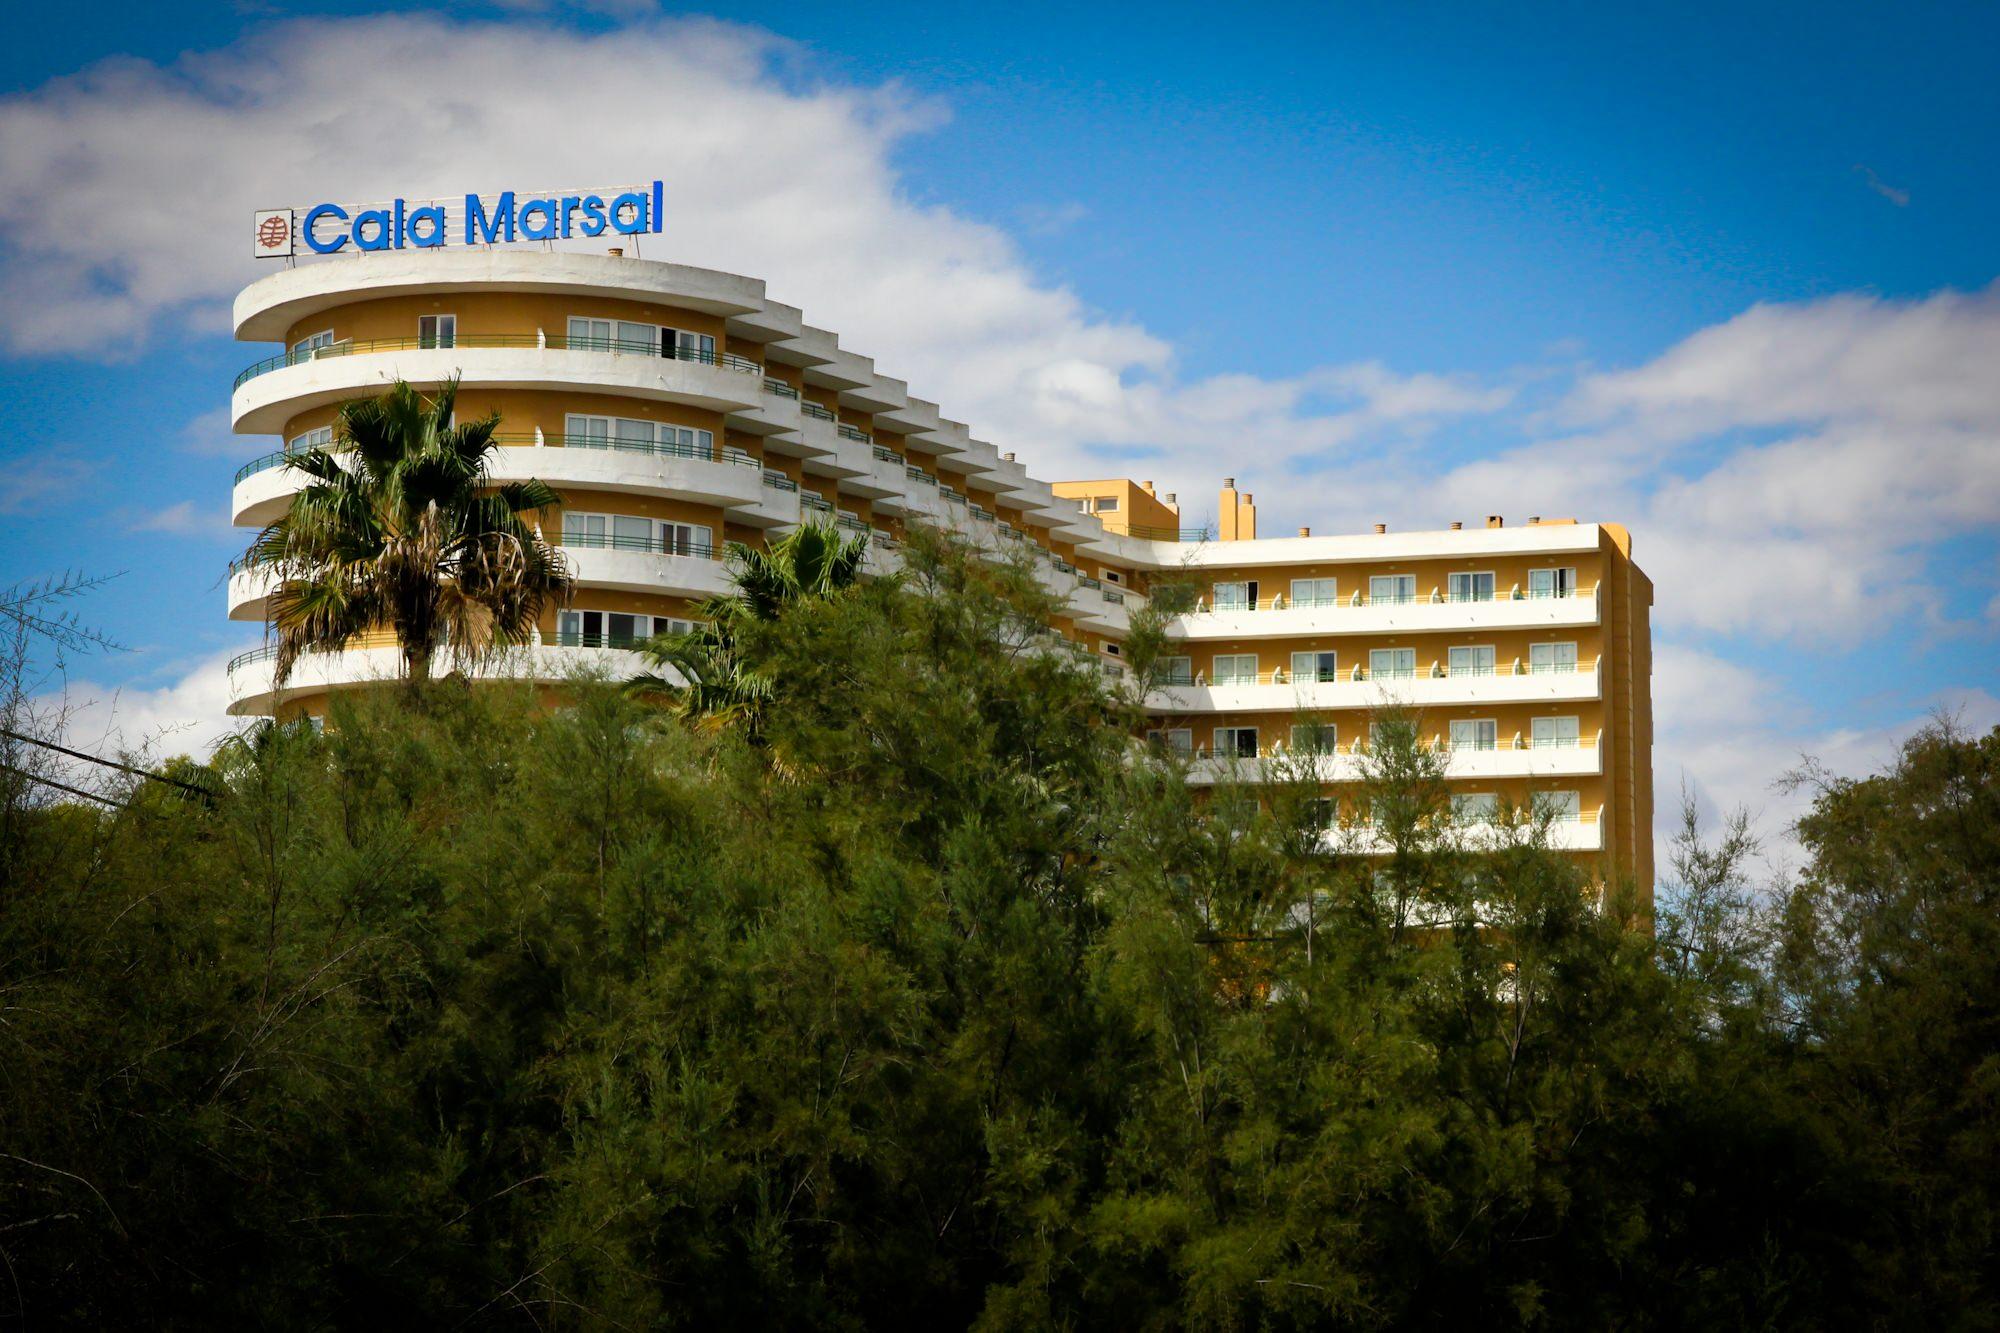 Hotel Cala Marsal